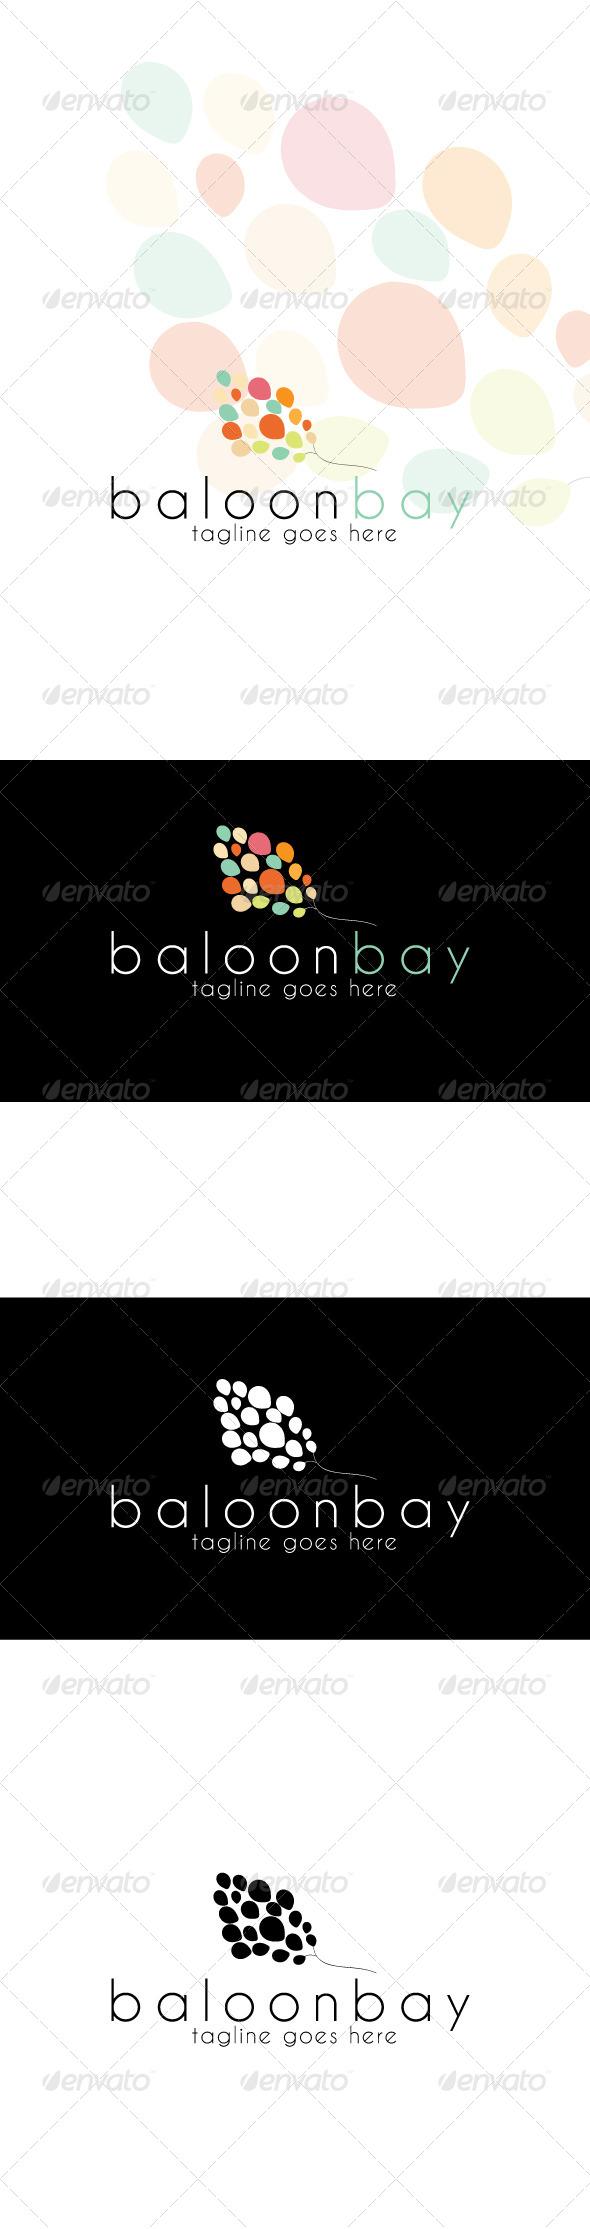 GraphicRiver Baloonbay Logo 4063267